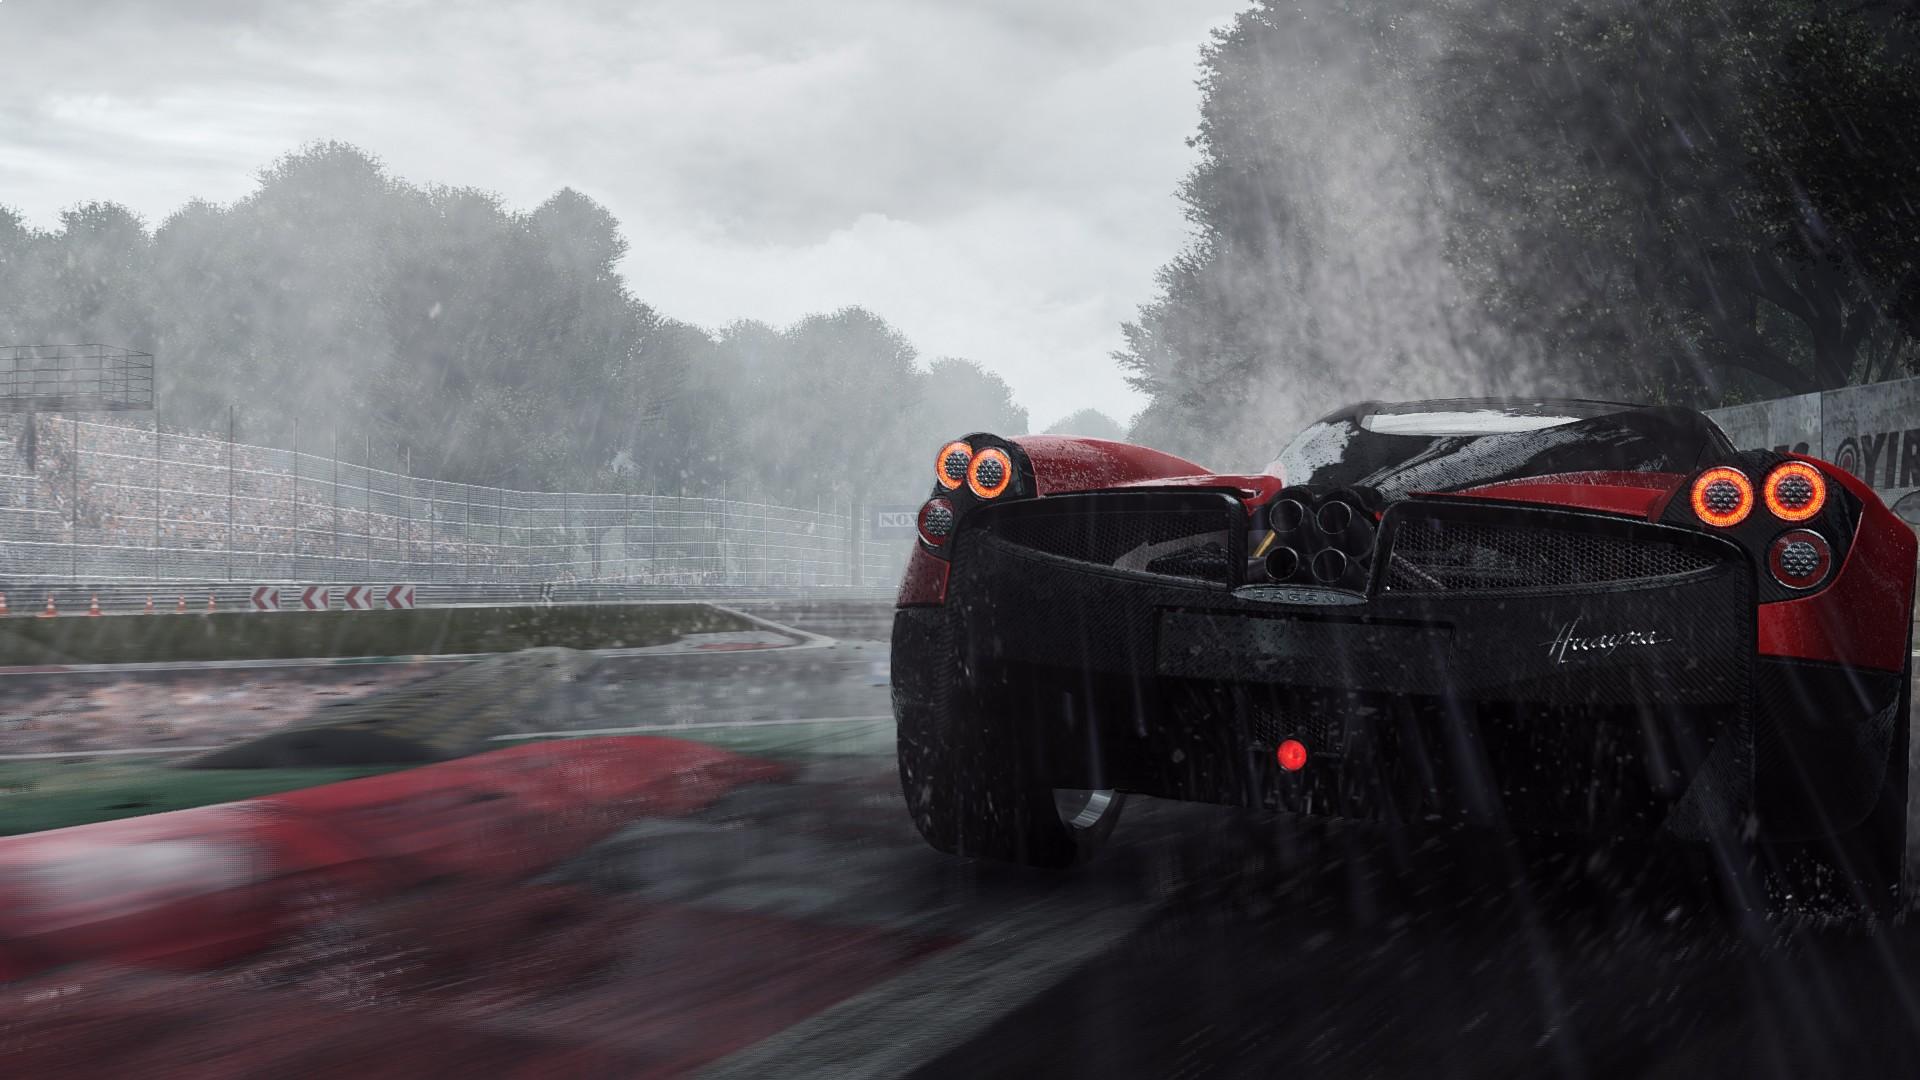 791399-cars-game-pagani-huayra-project-cars-rain-taillights-track